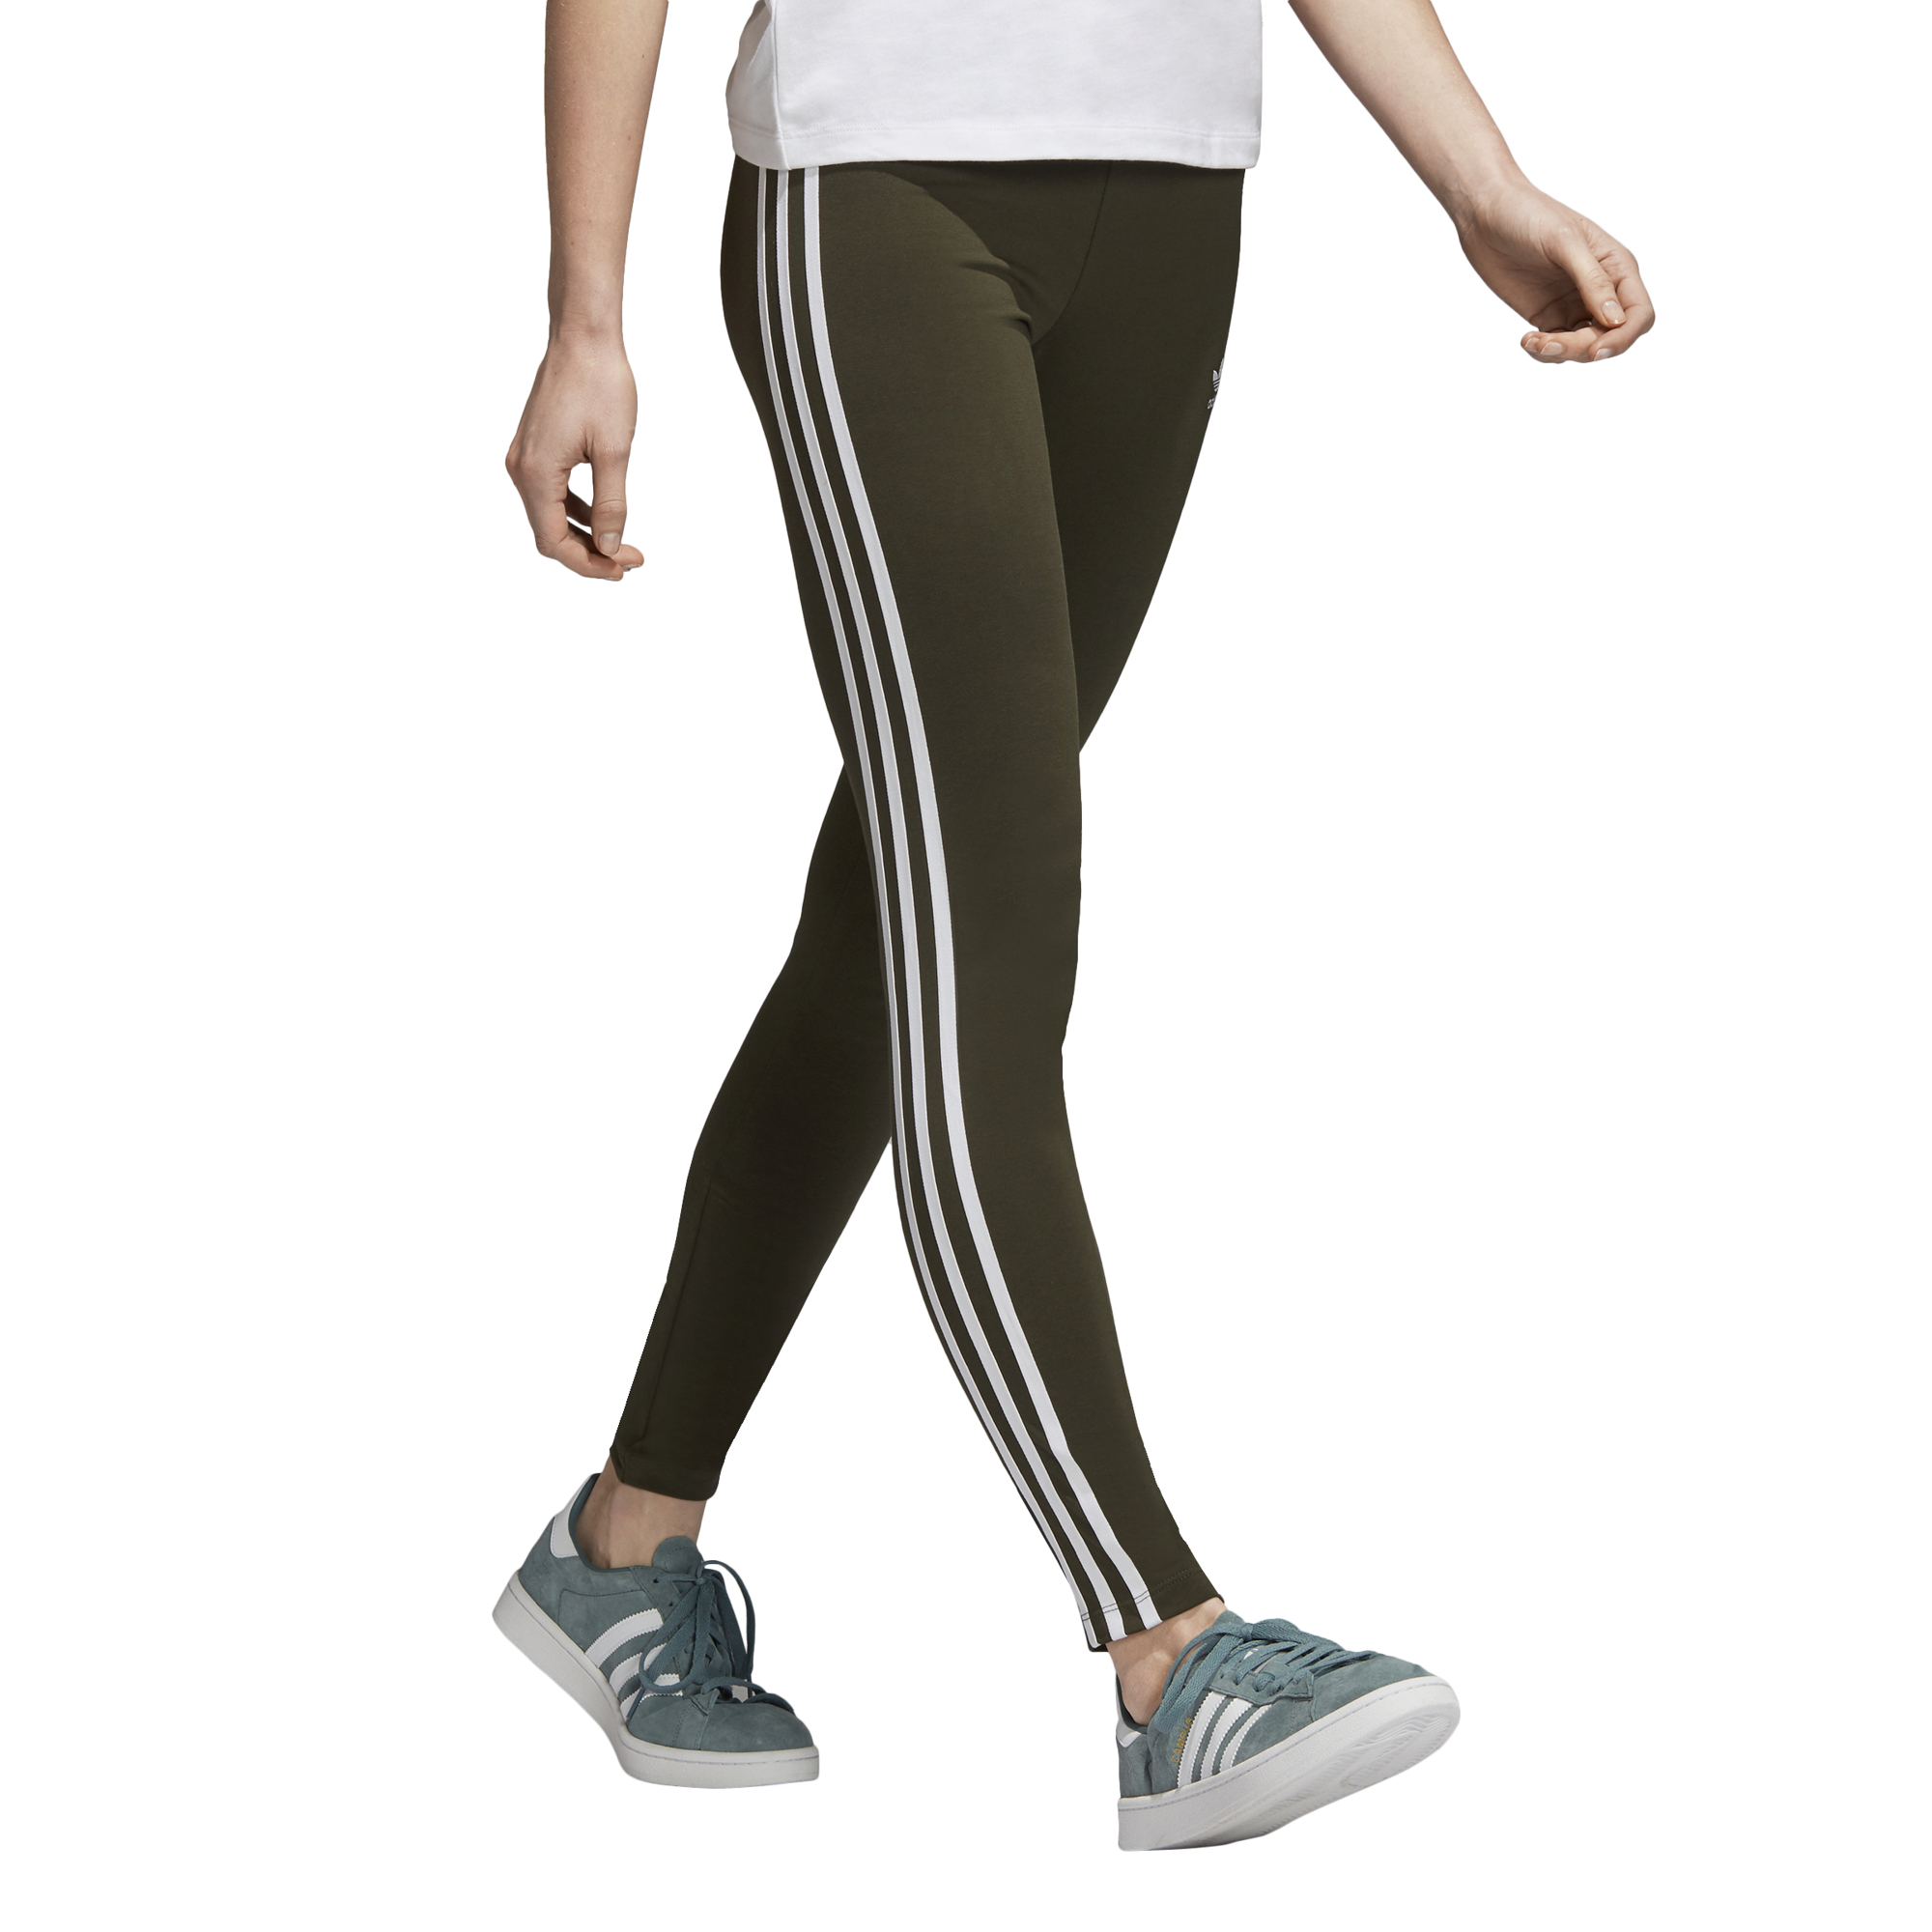 e9c3c4fdd3a2d legginsy adidas 3-stripes DH3171    timsport.pl - dodatkowe zniżki ...